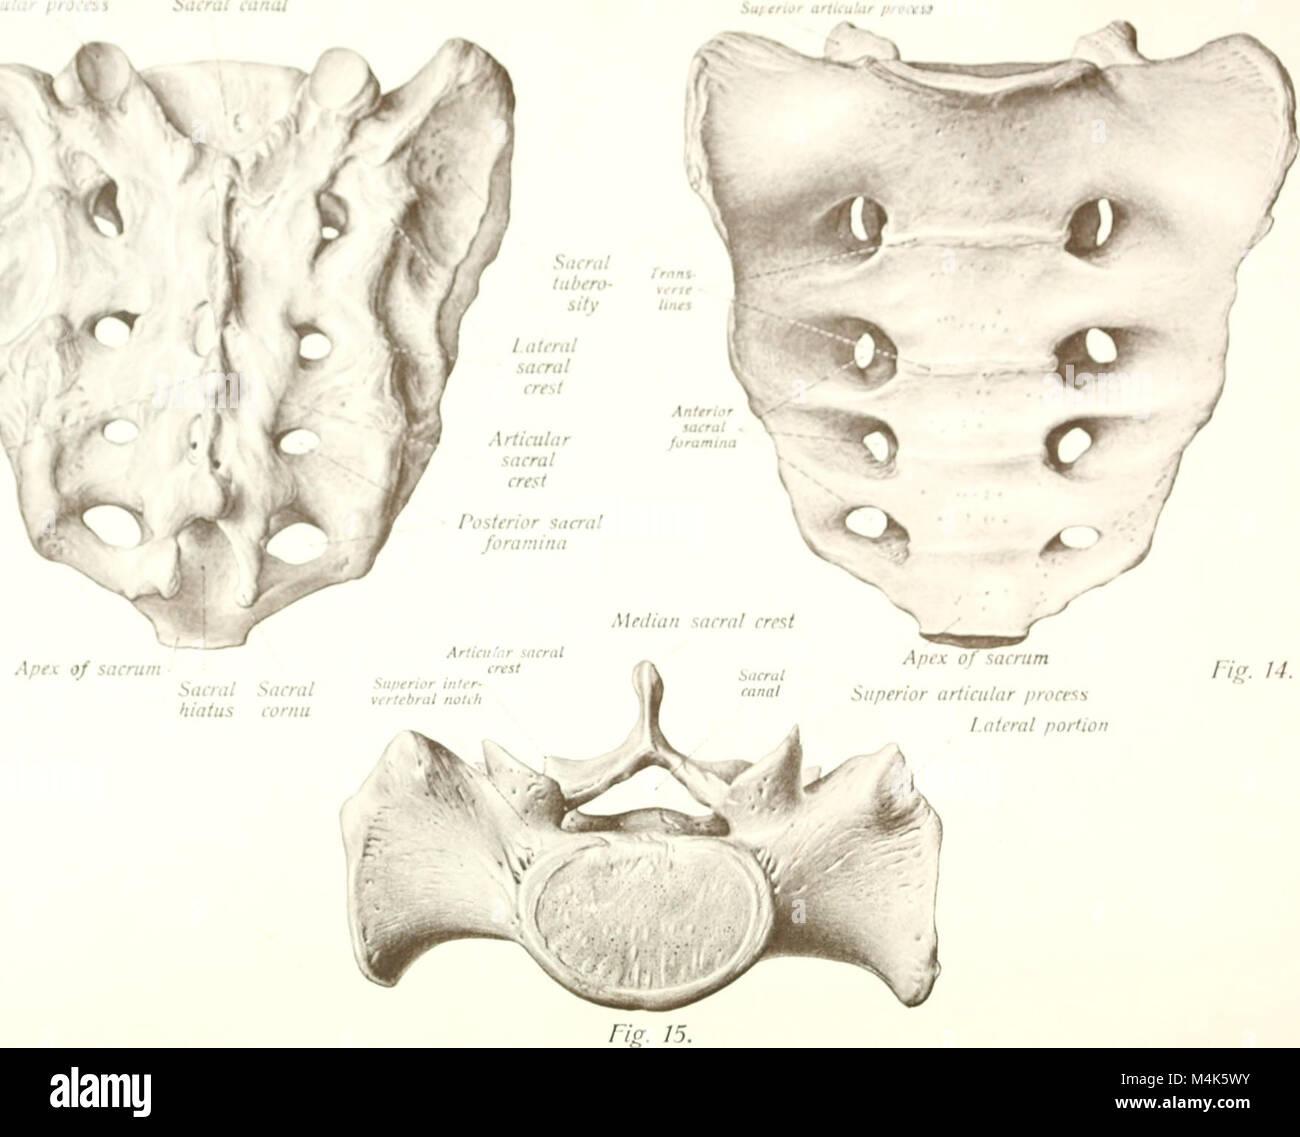 Sacral Hiatus Anatomy Gallery - human body anatomy